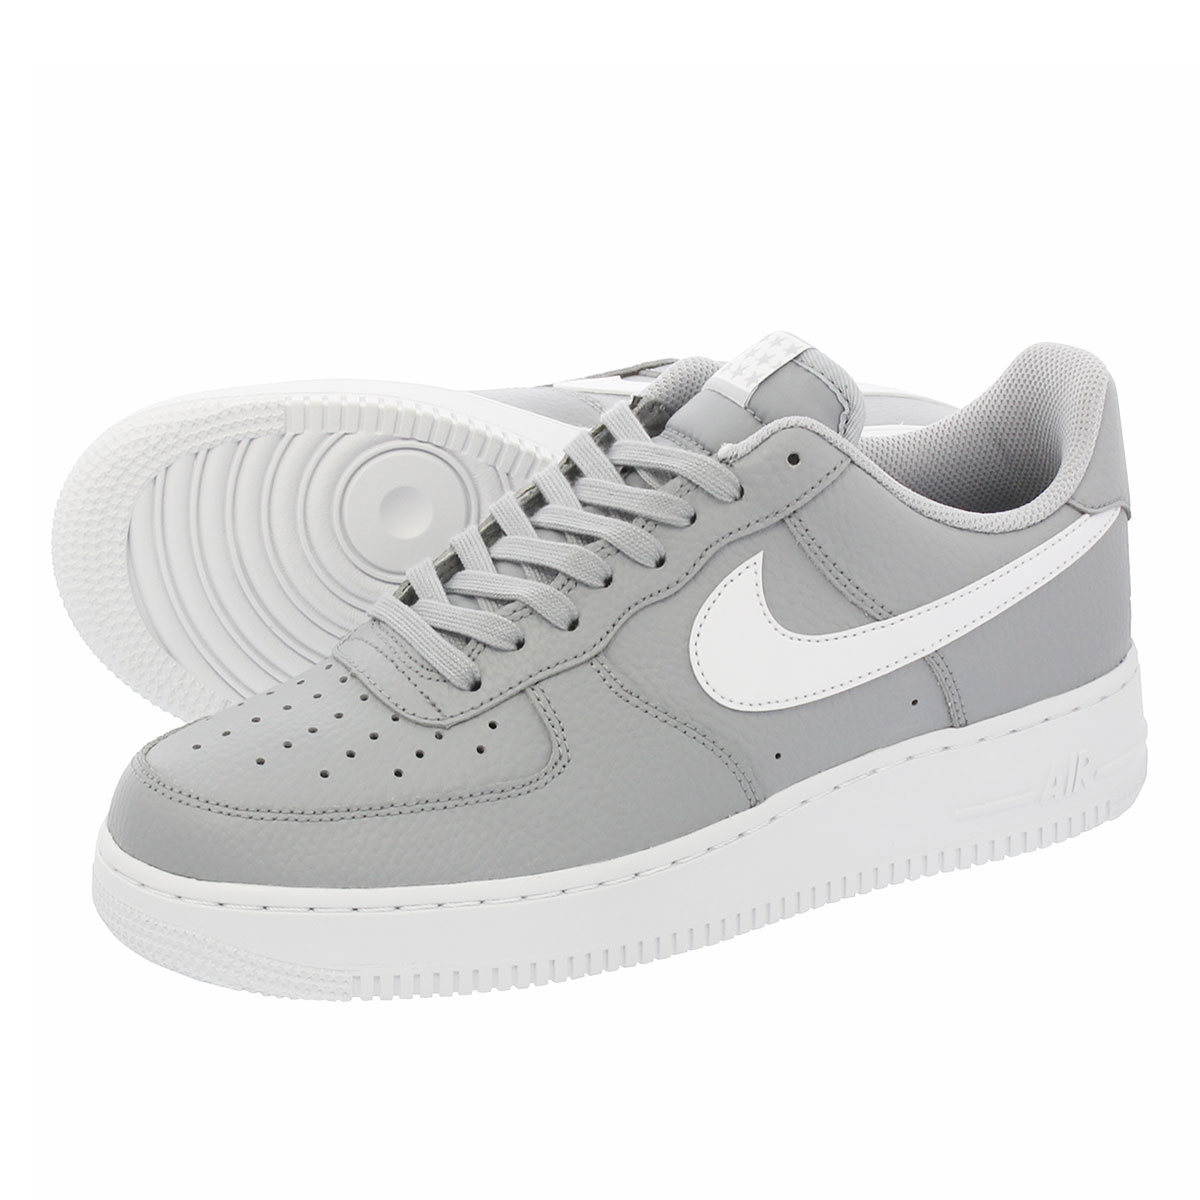 LOWTEX PLUS  NIKE AIR FORCE 1  07 Nike air force 1  07 WOLF GREY WHITE  aa4083-013  080caf35b